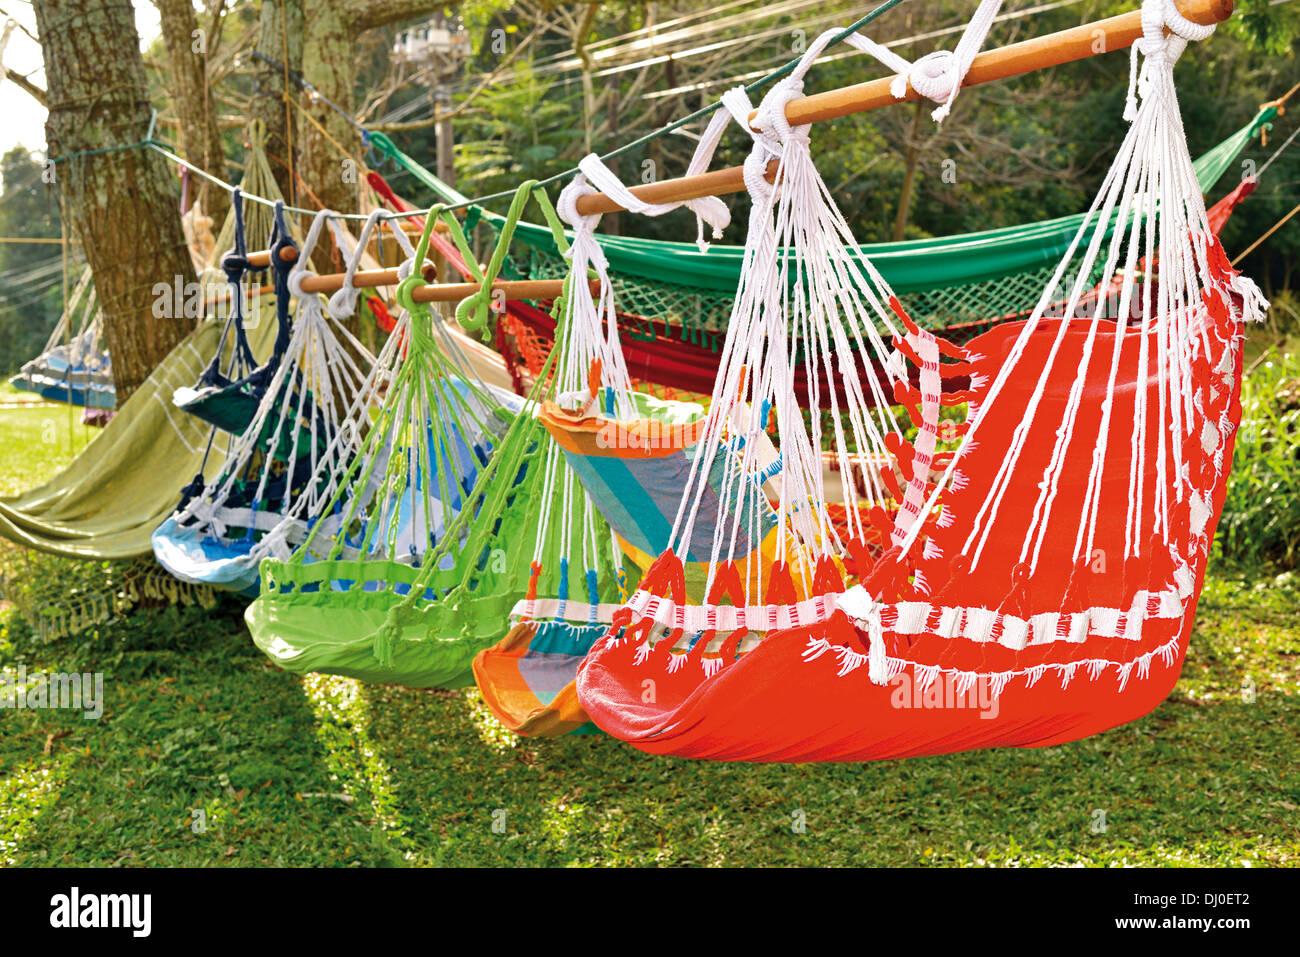 Brazil, Iguassu National Park: Colorful hammocks along the street  for sale as souvenirs - Stock Image